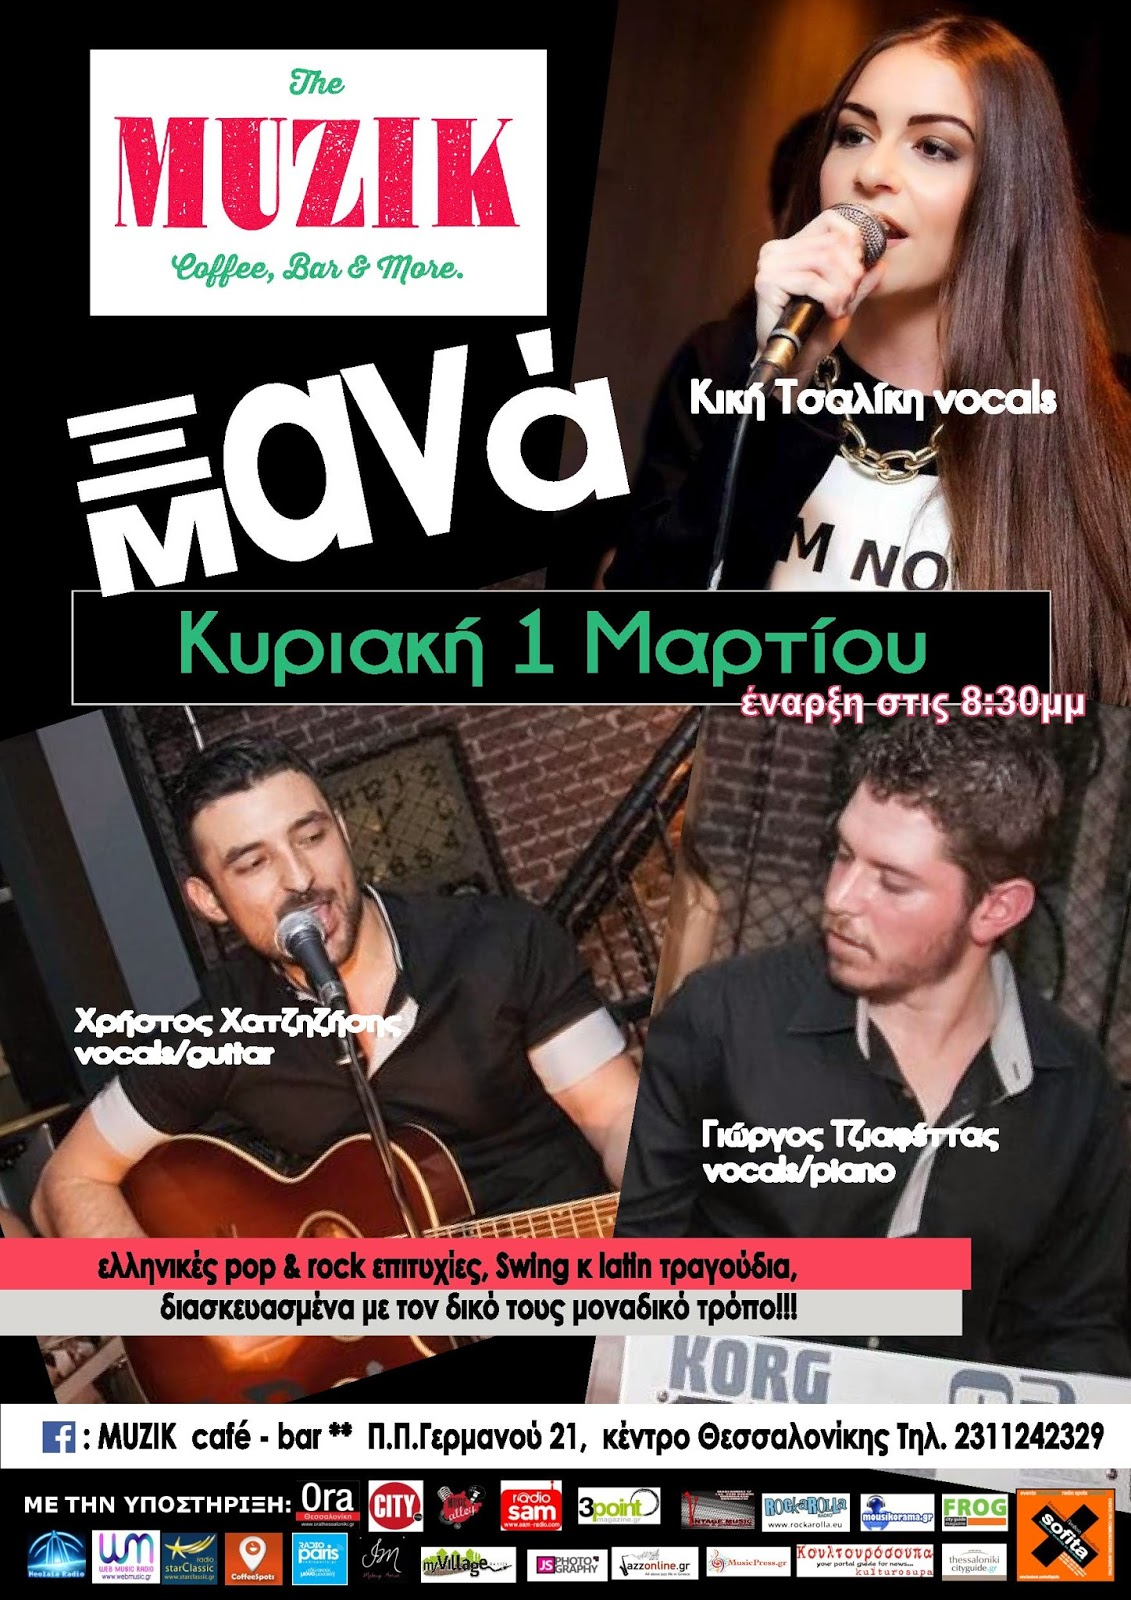 oi-ksana-mana-sto-muzik-cafe-bar-kyriaki-1-martiou